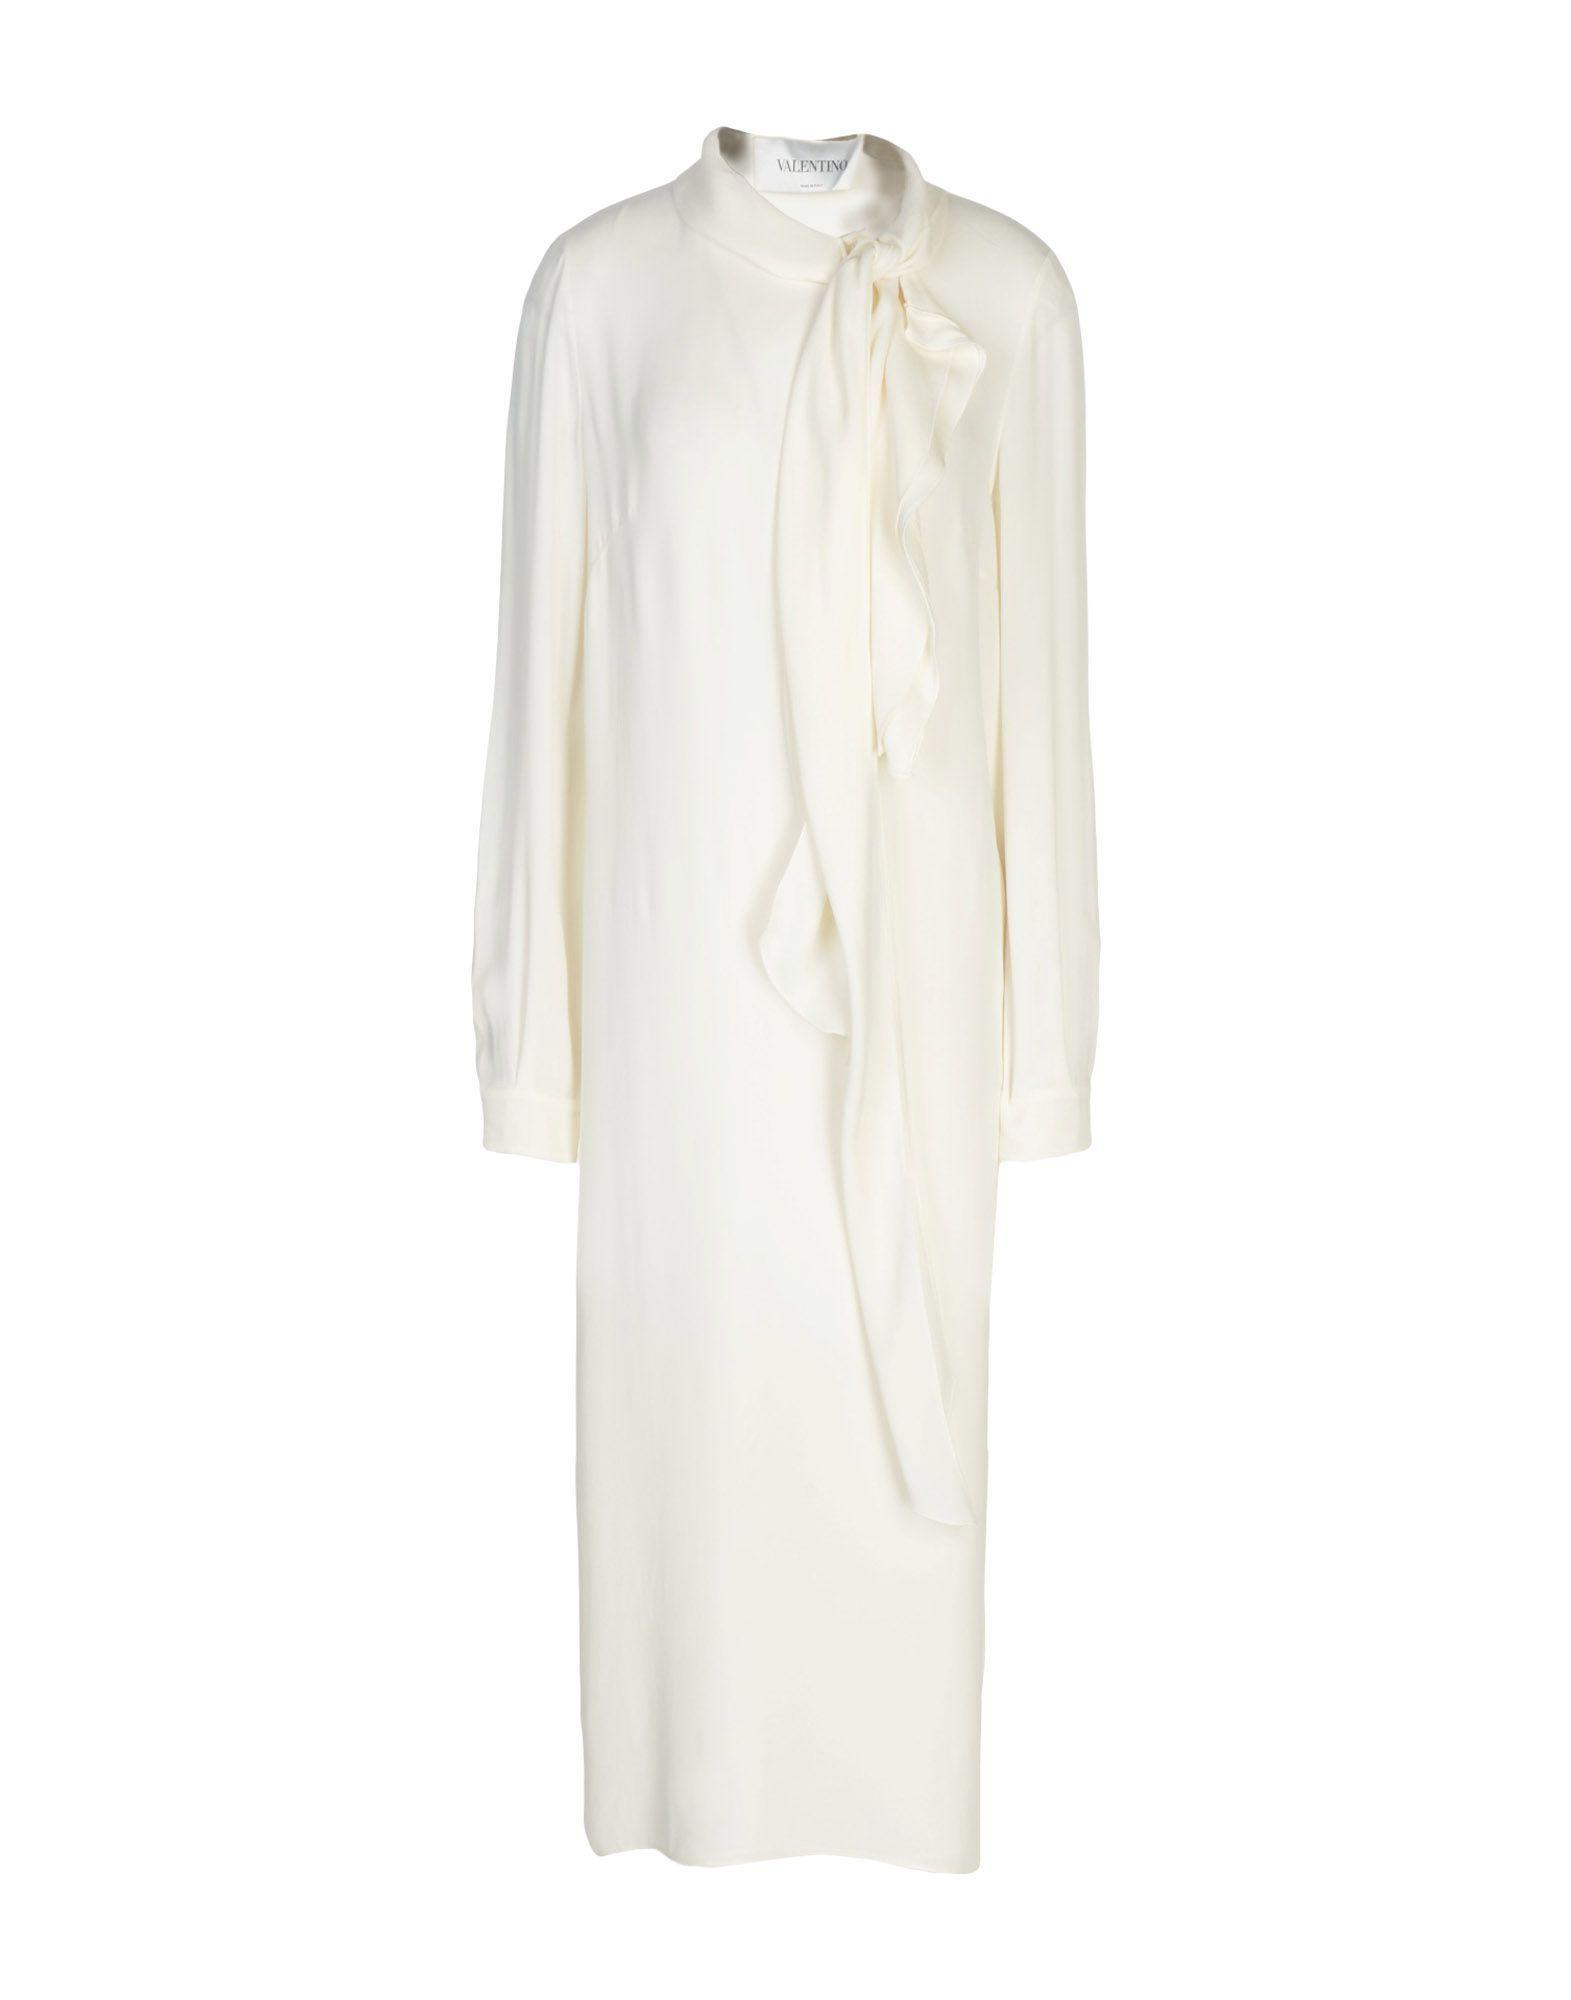 VALENTINO Платье длиной 3/4 платье рубашка fox yulia sway платье рубашка fox